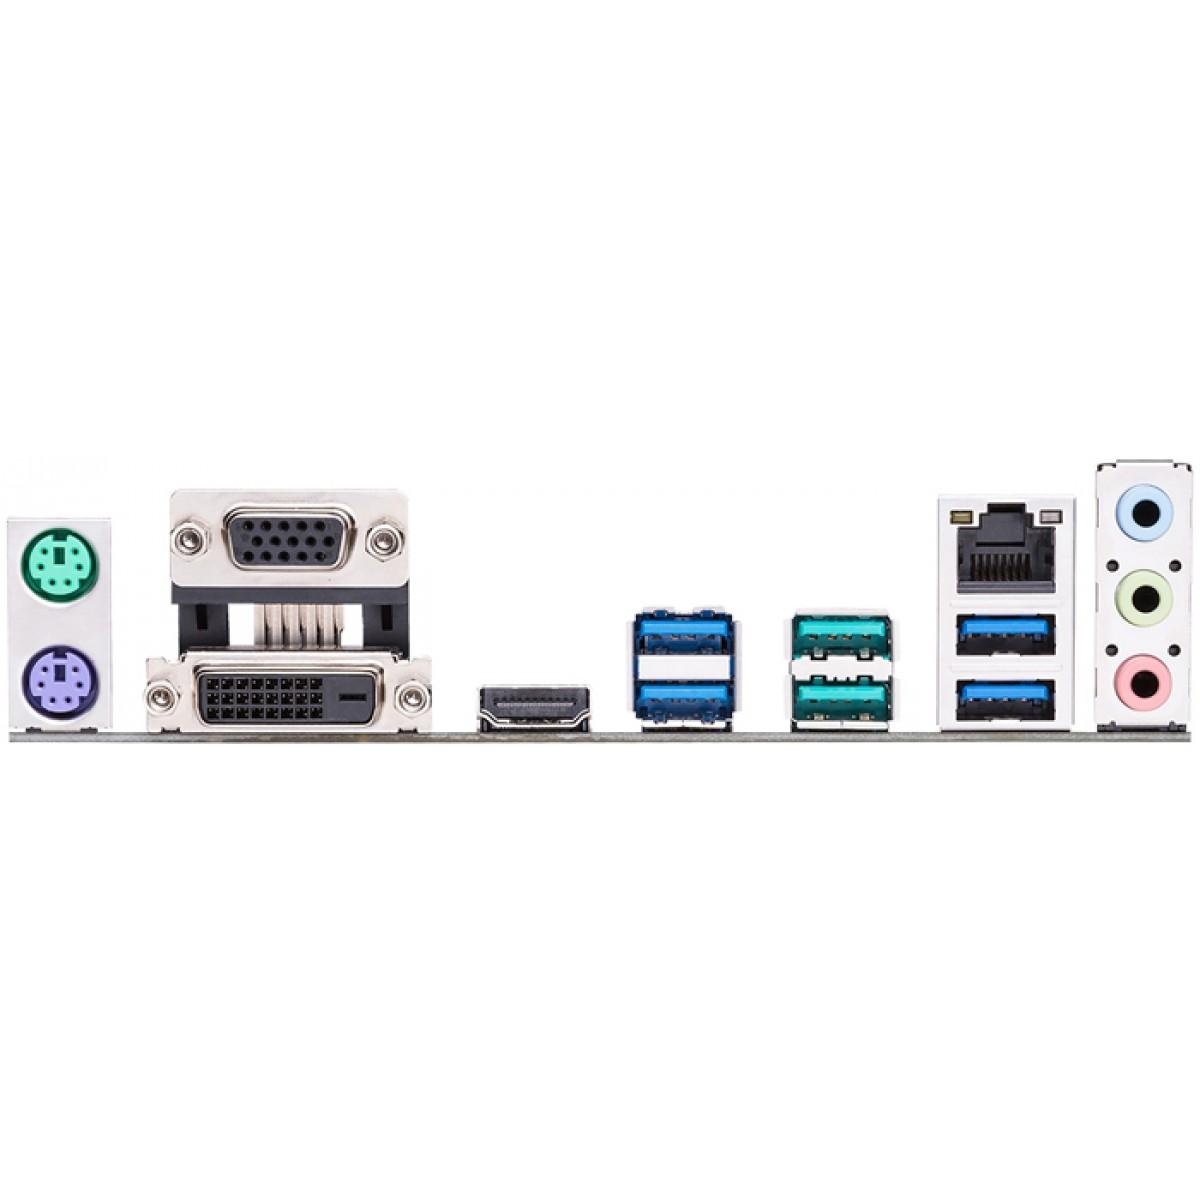 Placa Mãe Asus Prime B450M-A, Chipset B450, AMD AM4, mATX, DDR4